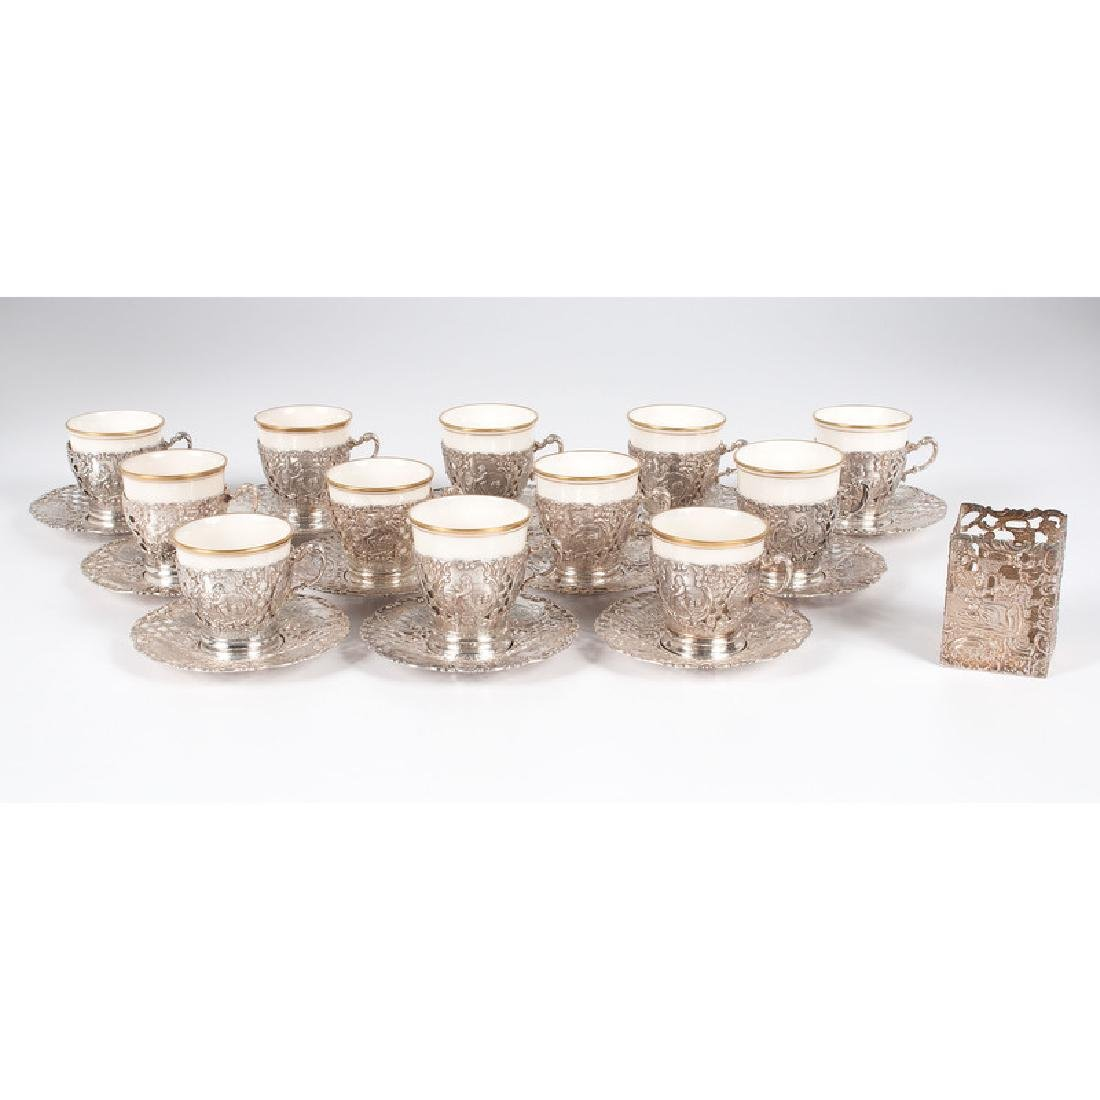 German .800 Silver &  Wyler  Demitasse Cups and